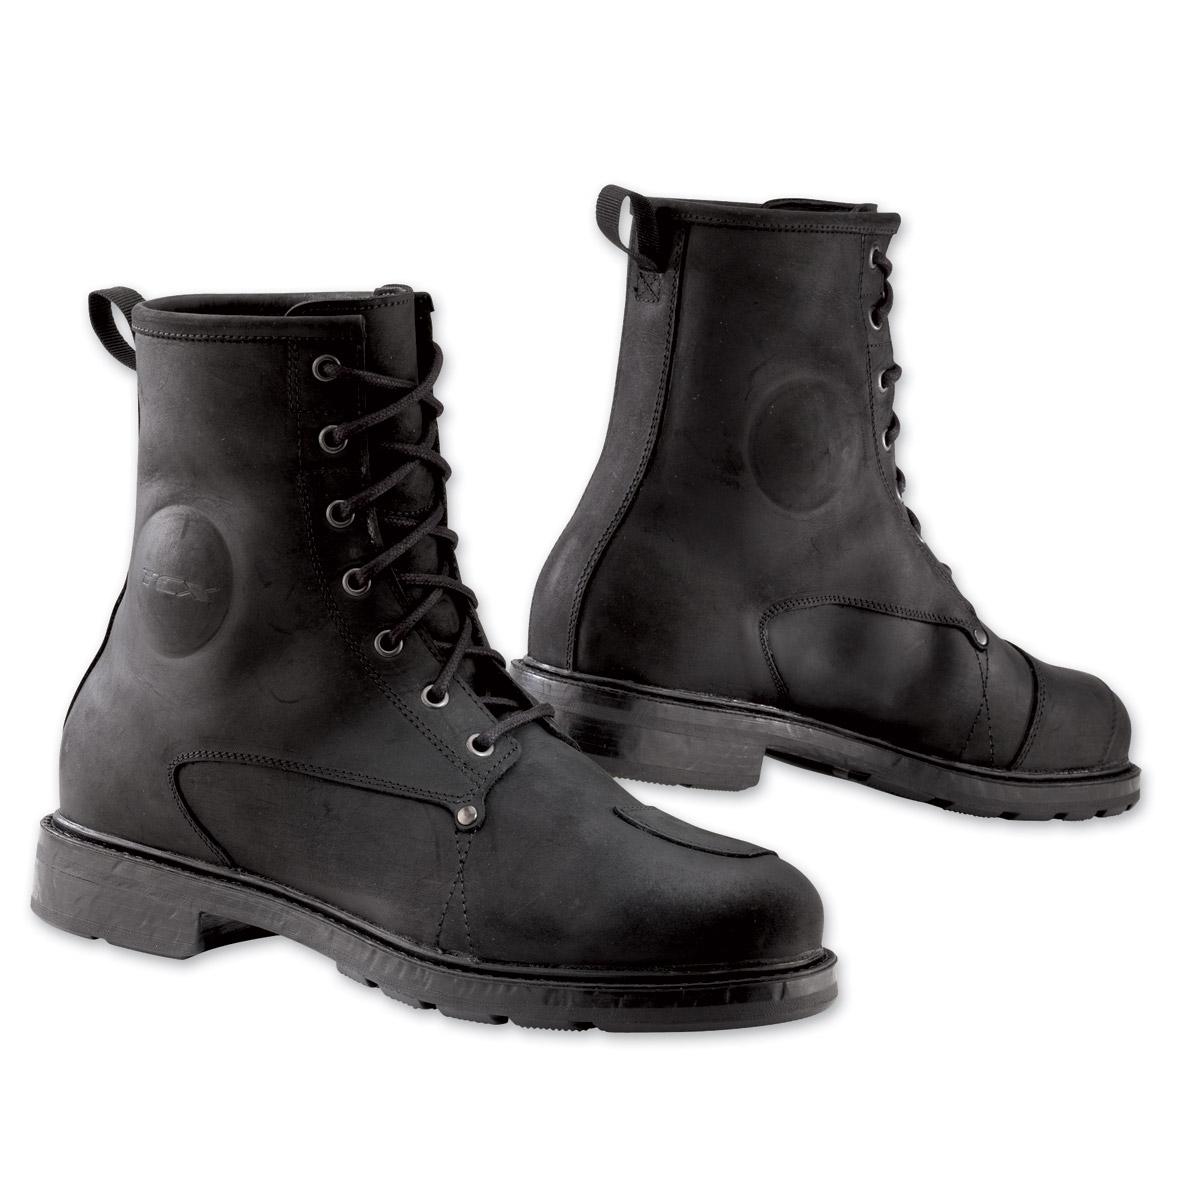 TCX X-Blend Waterproof Men's Black Boots